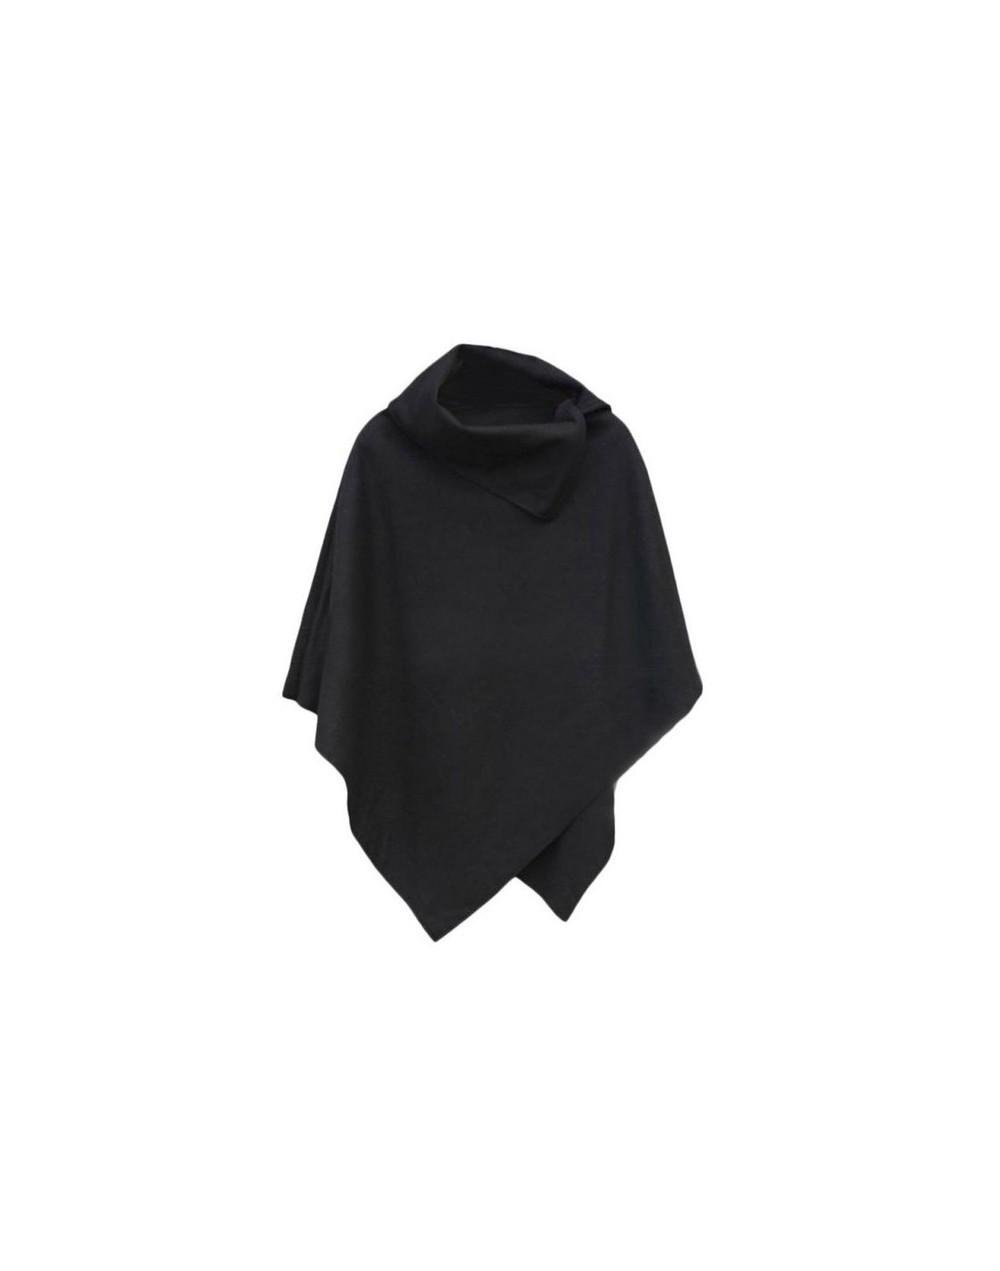 Sweater Women Cape Cloak Coat Tops Jackets Sweater Women Pullover Knitted Camisolas 2018 - black - 493024331678-3